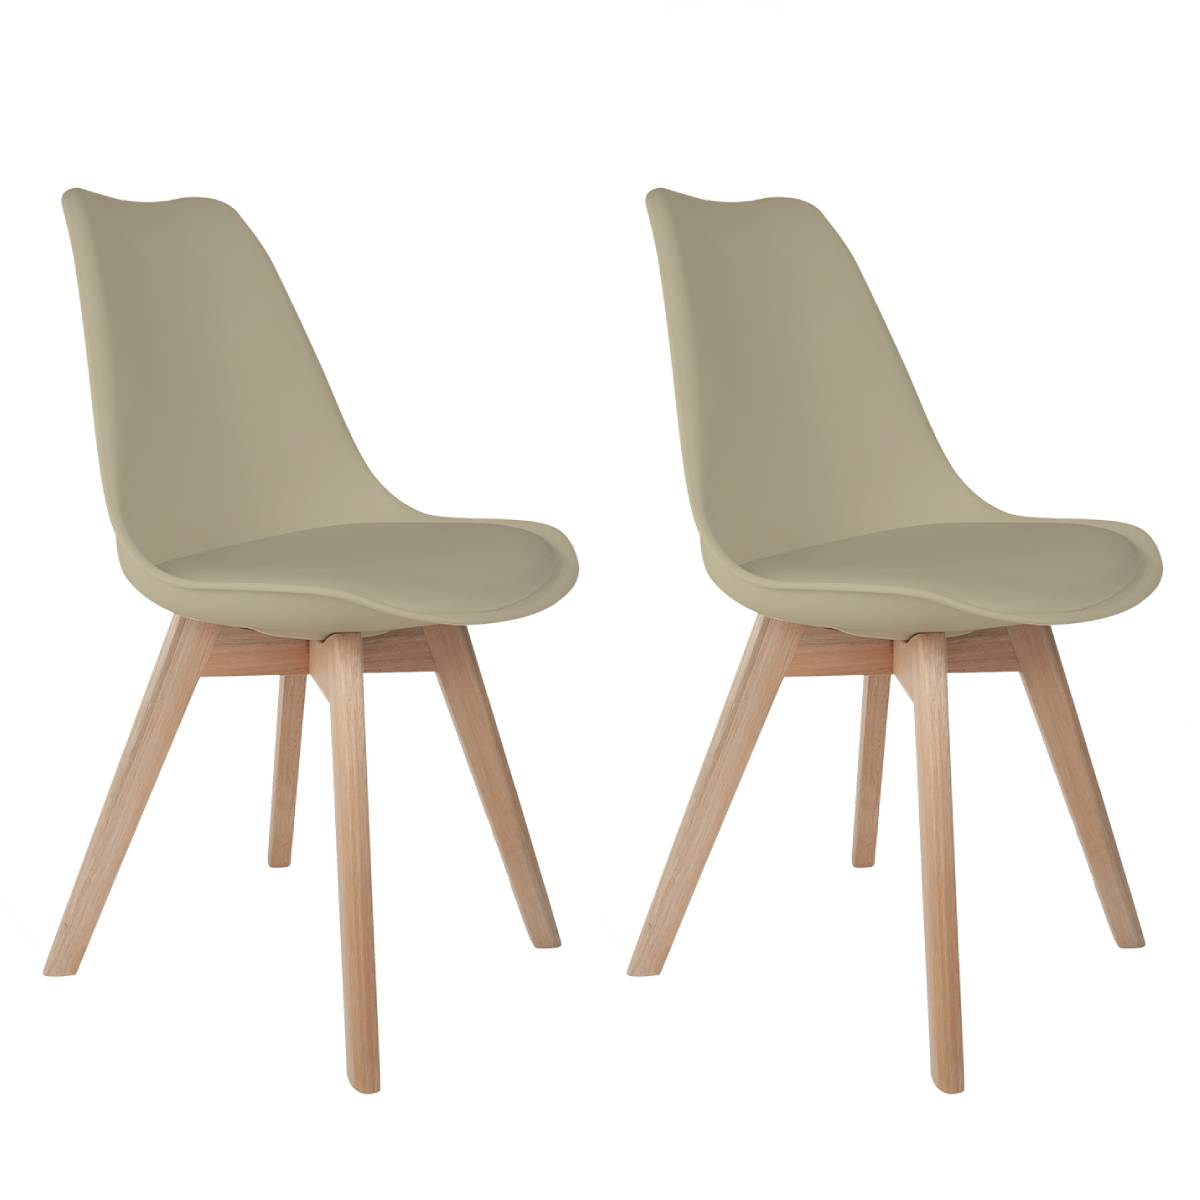 Conjunto com 2 Cadeiras Saarinen Nude - Base Wood